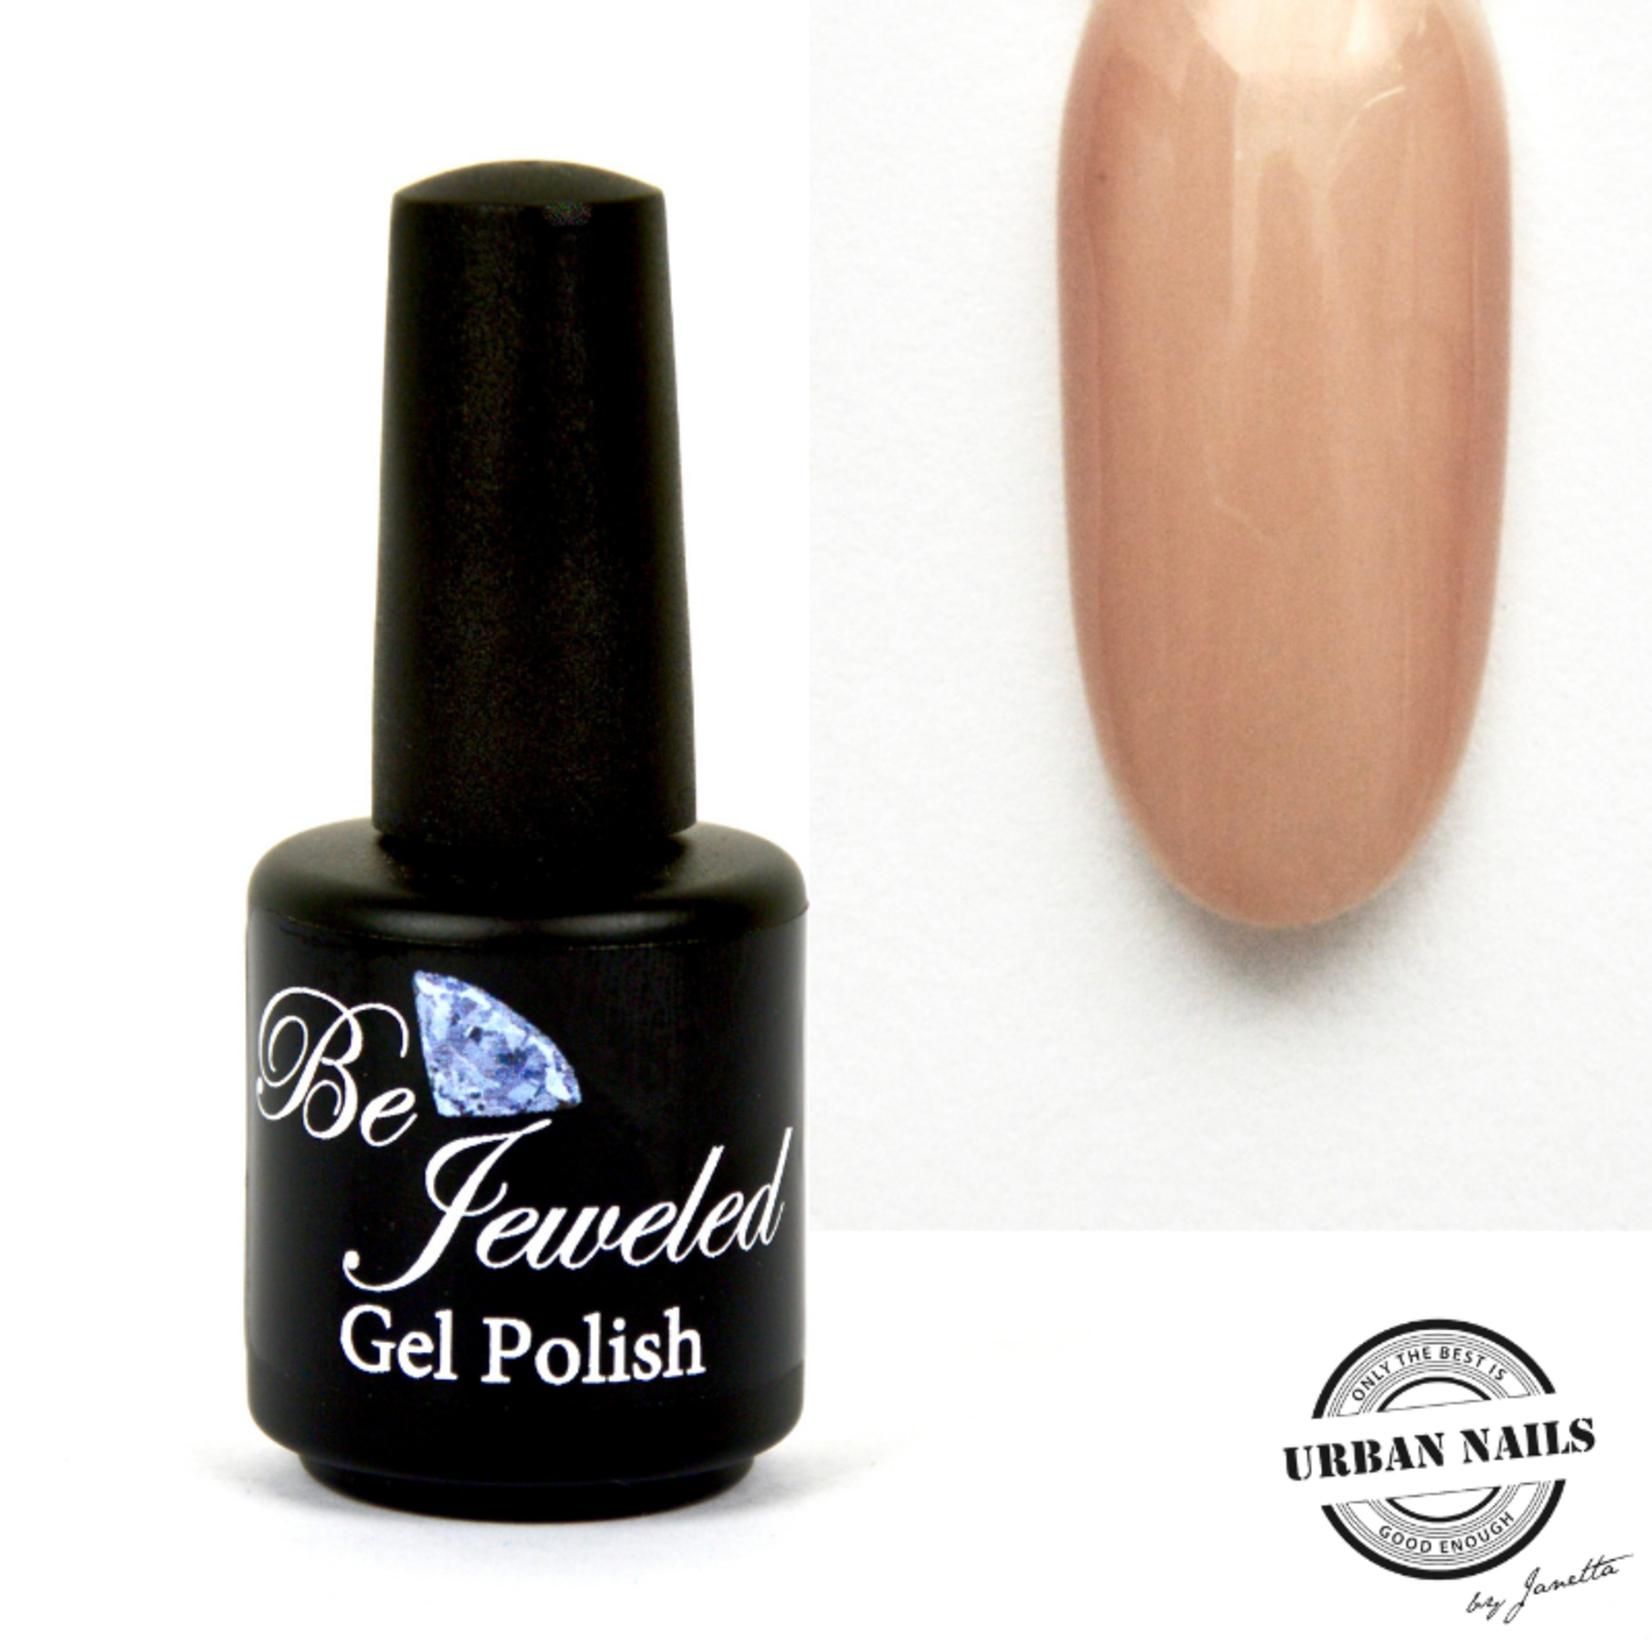 Urban Nails Be Jeweled Gelpolish 07 Nude Beige Met Shimmer